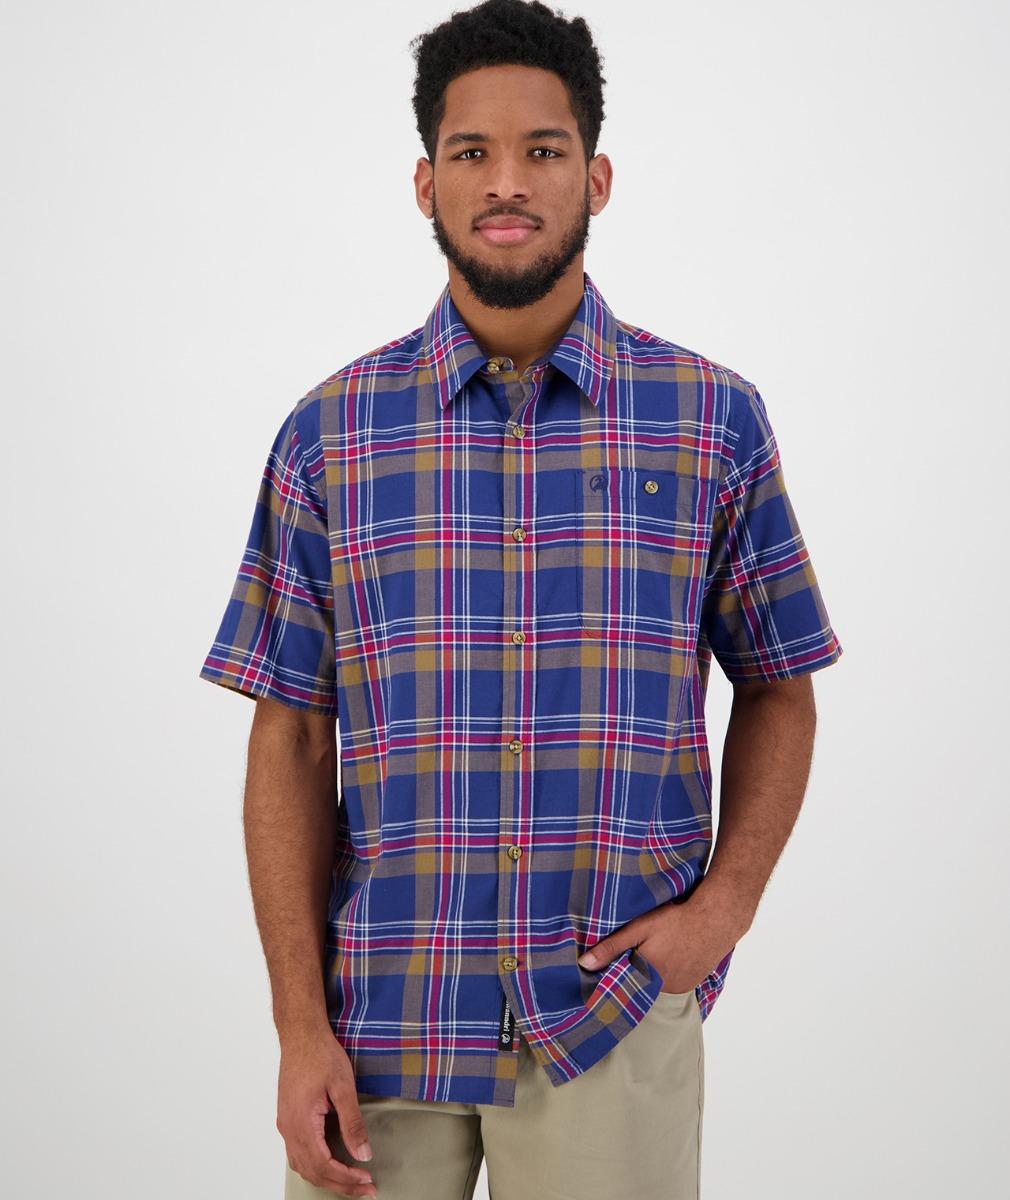 Swanndri Men's Oak Bluffs Short Sleeve Shirt in Blue/Red